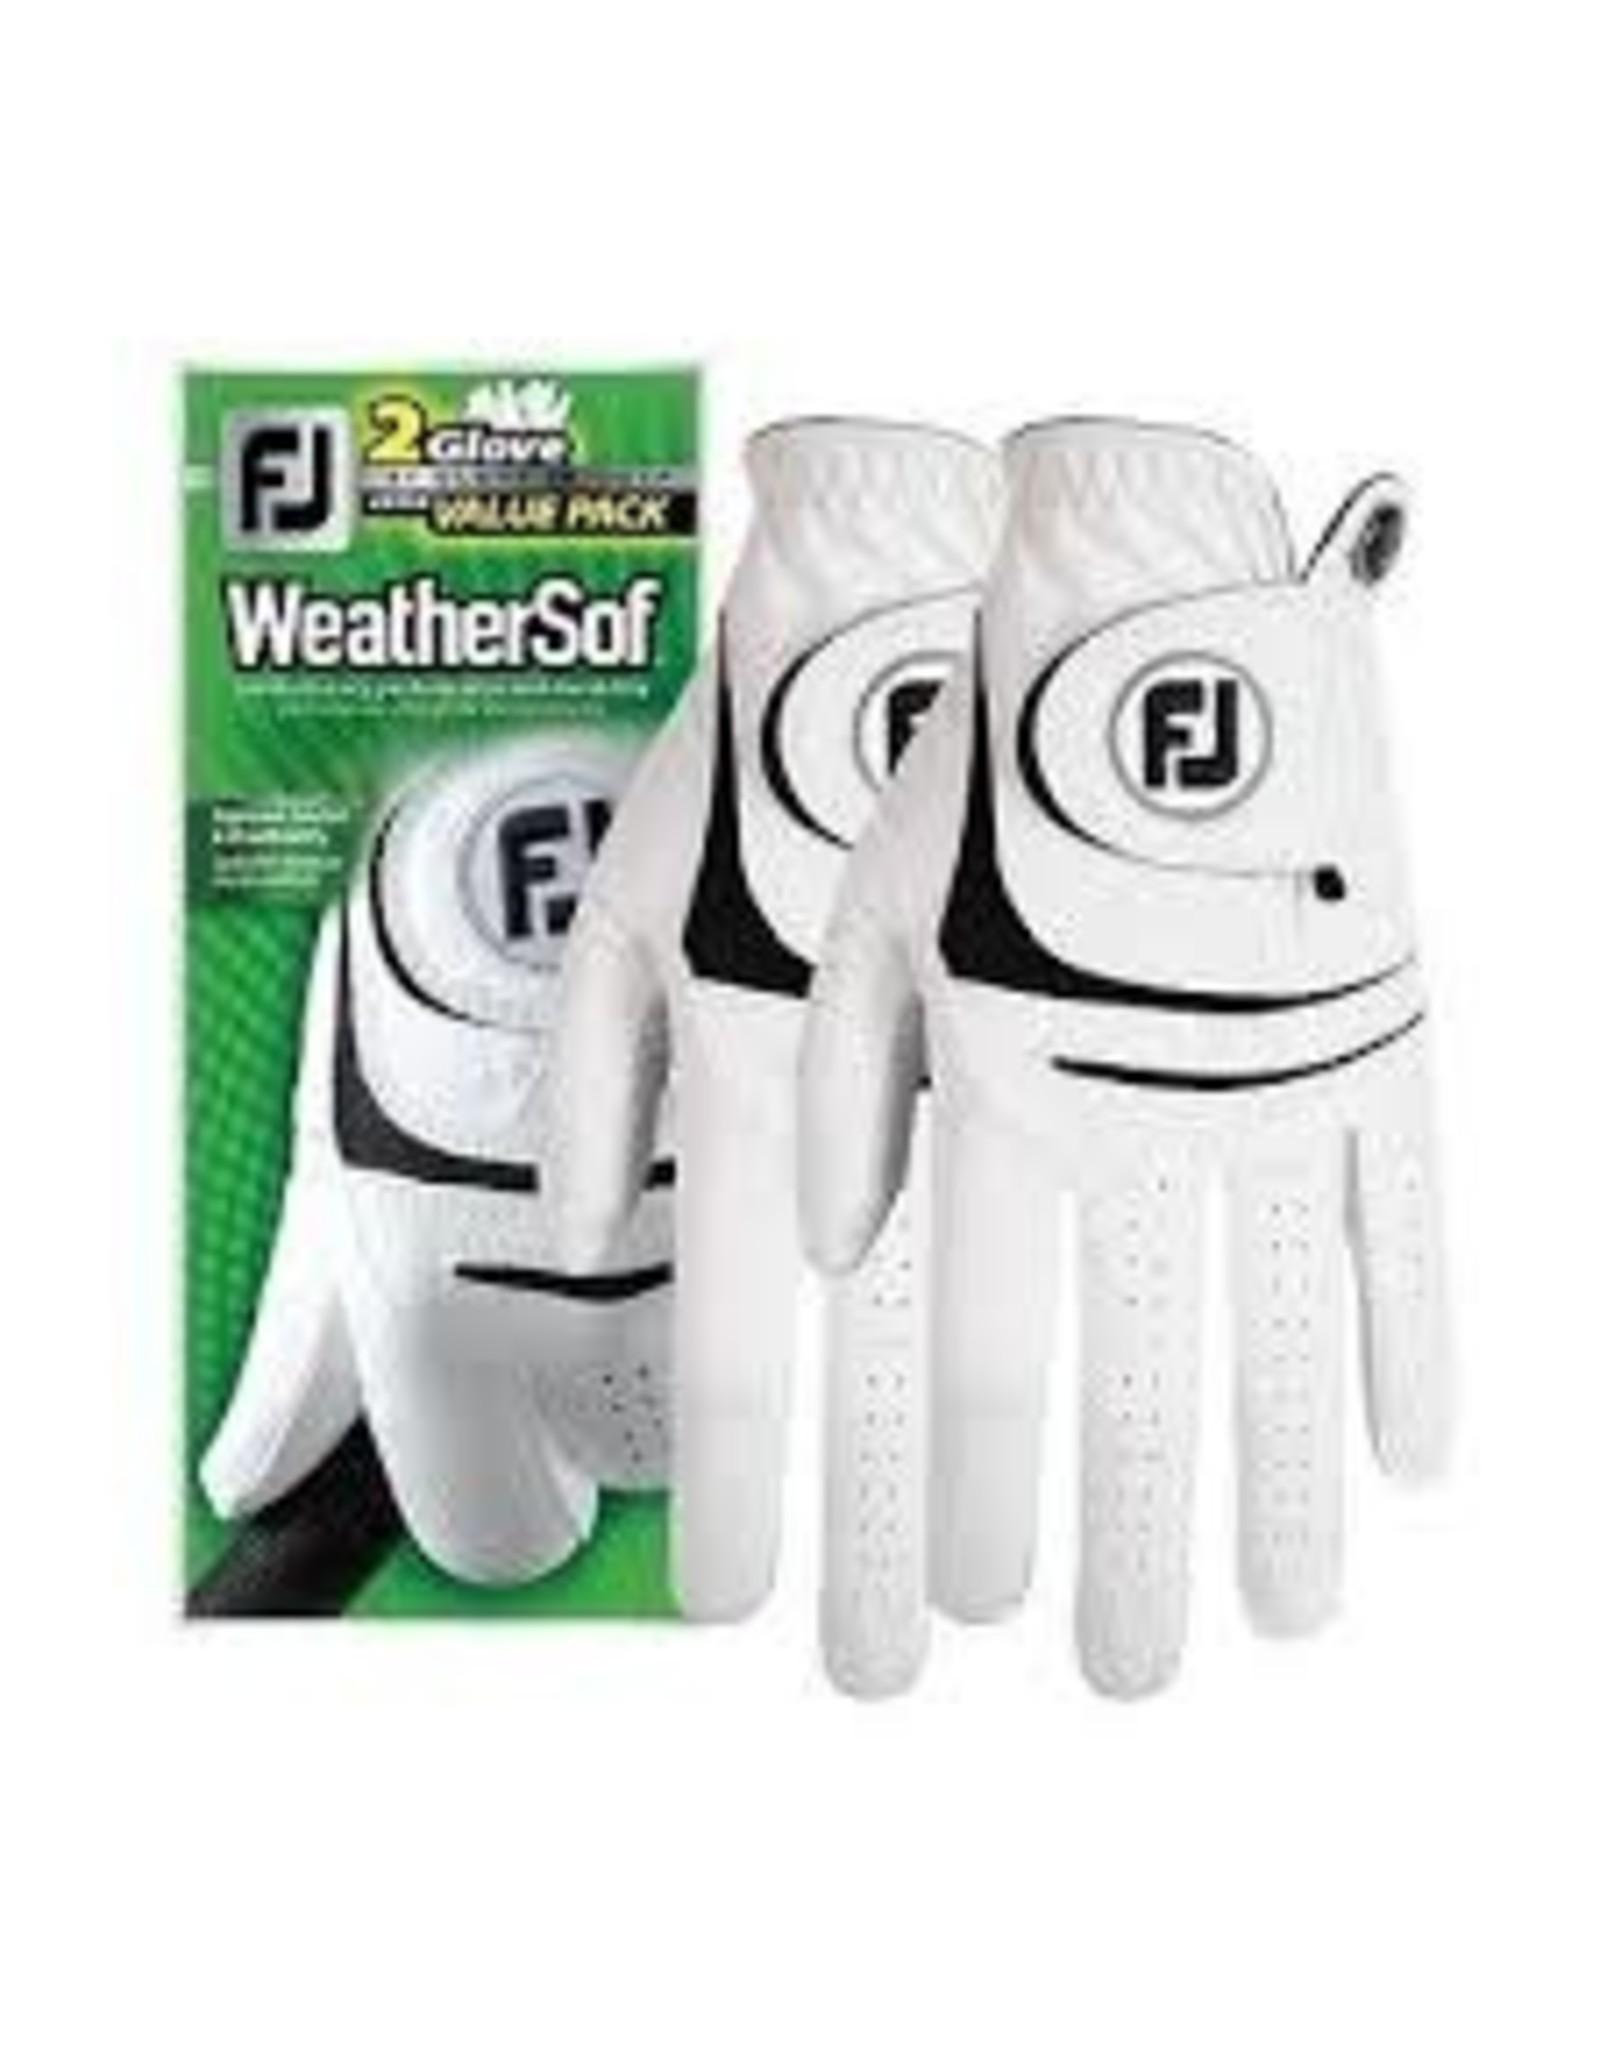 Acushnet FJ Ladies 2PK Weathersof Glove